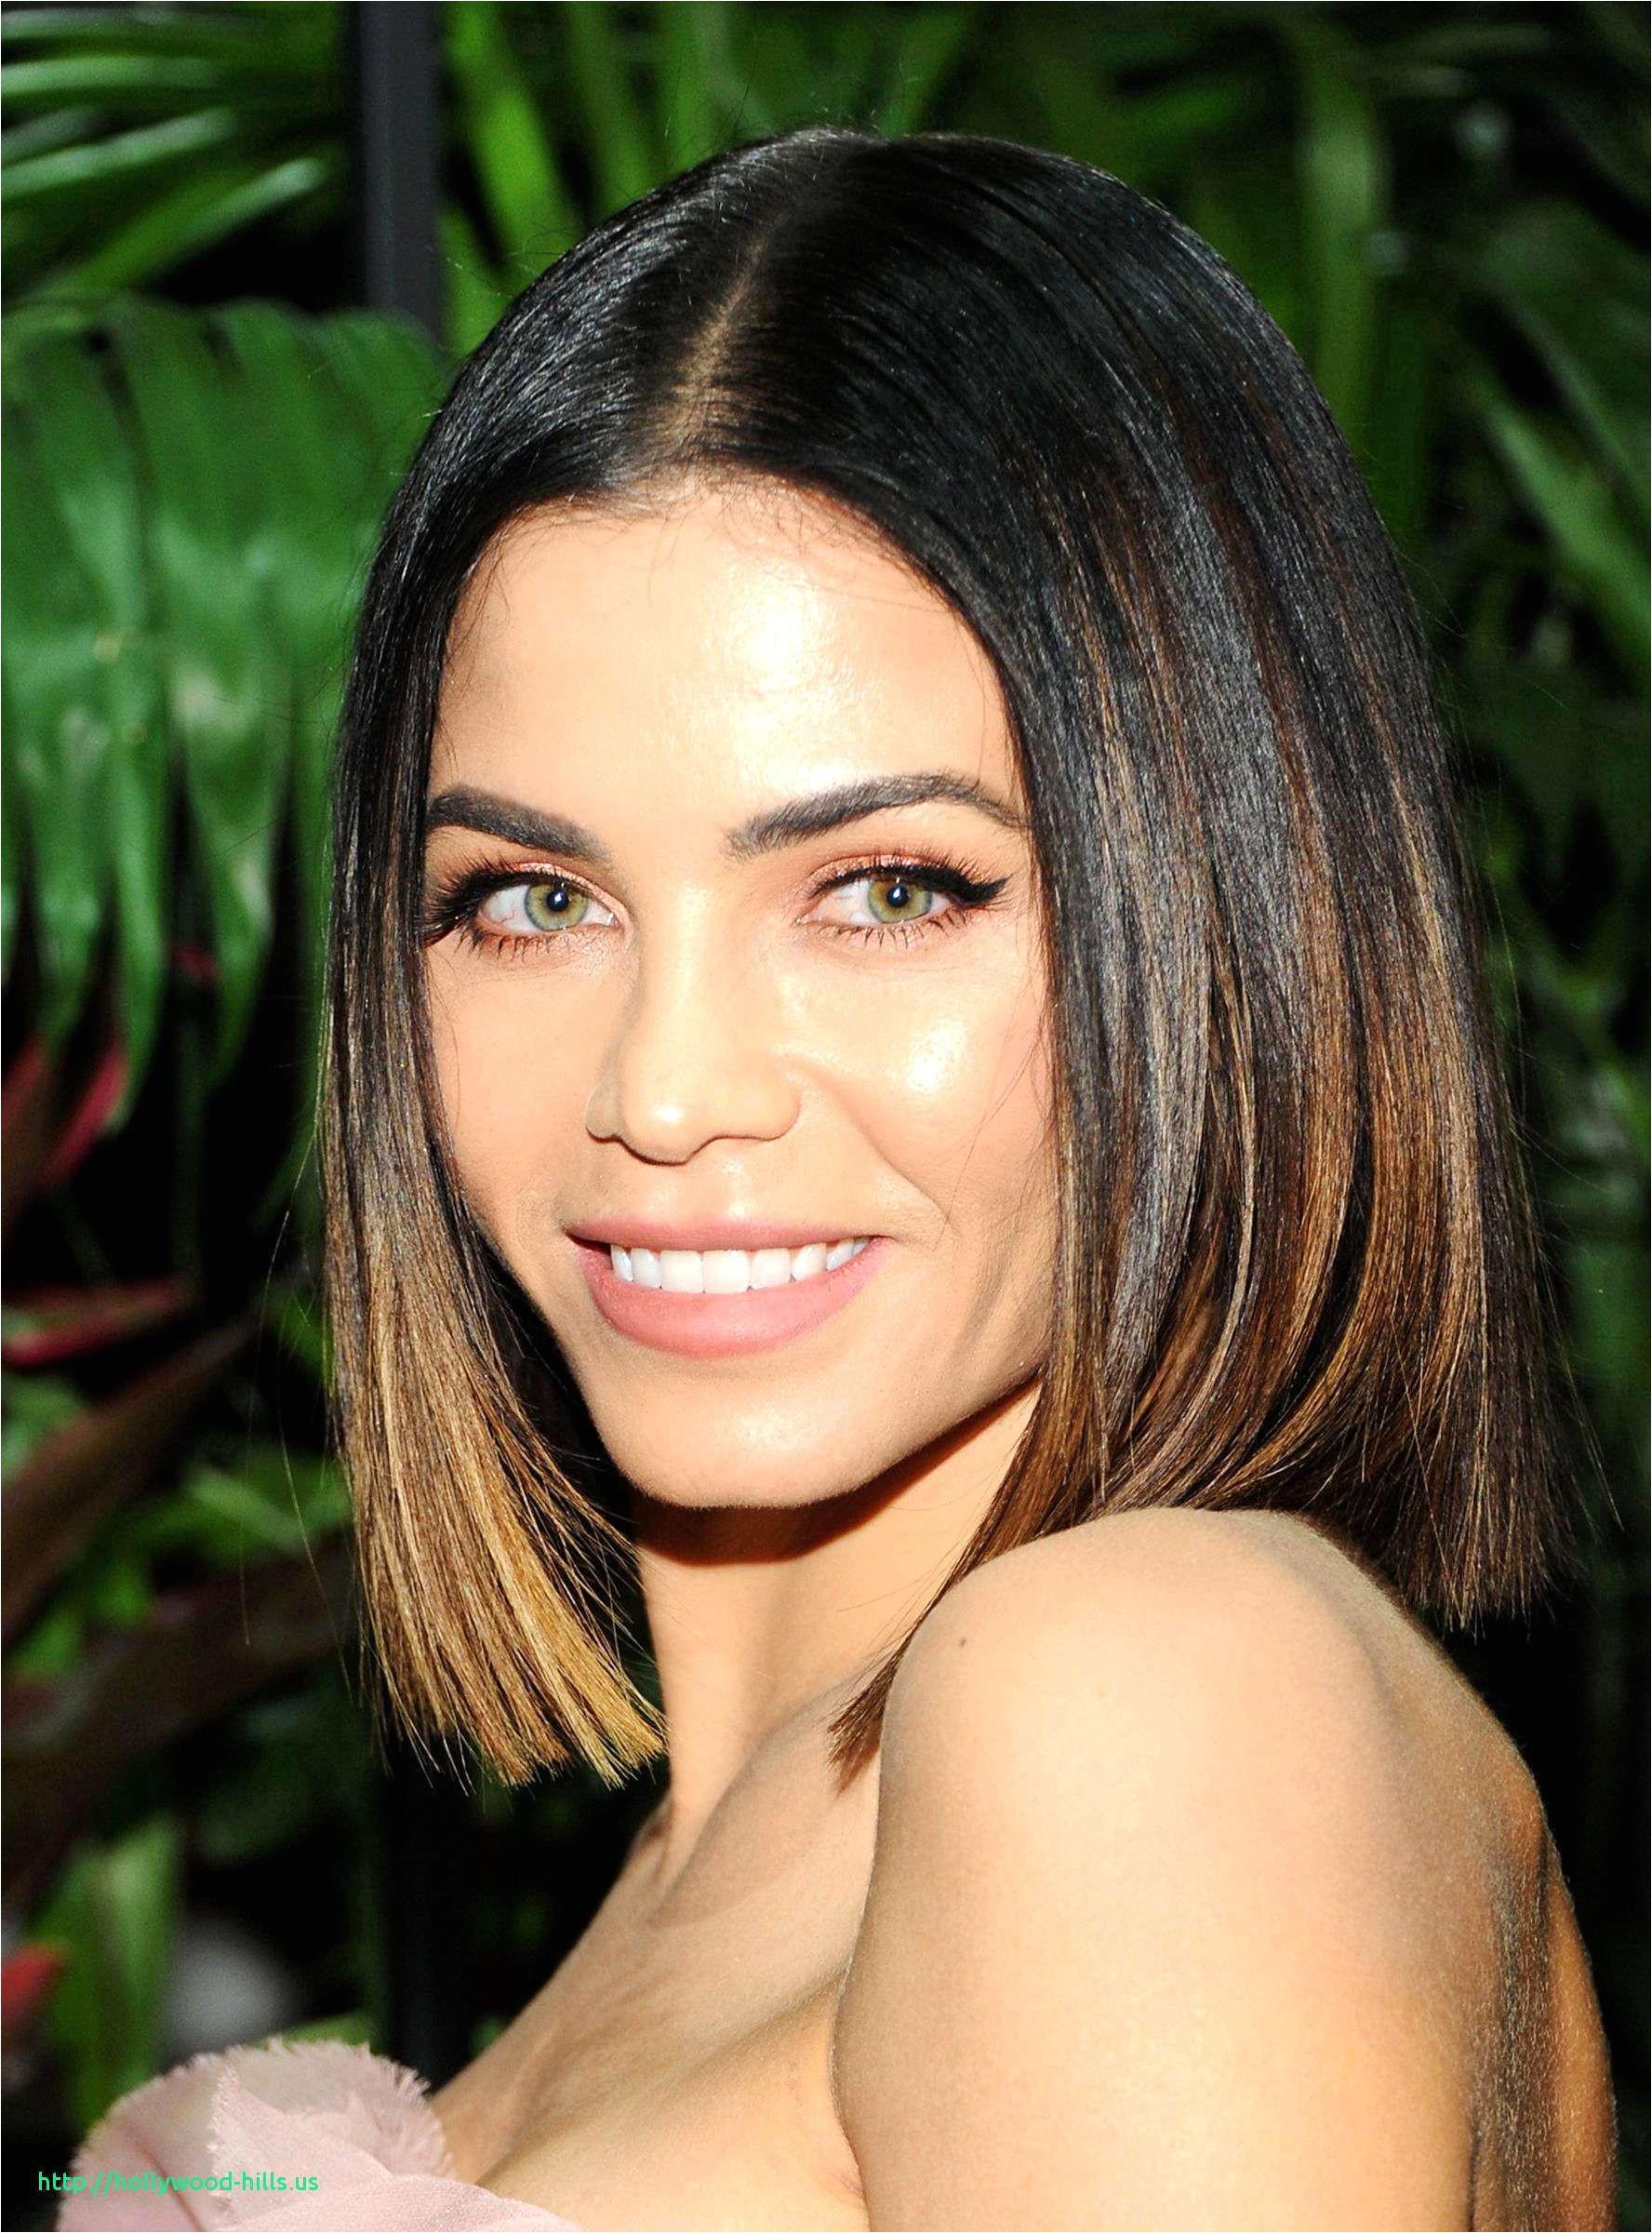 Hairstyles For Straightened Short Hair Medium Haircuts Shoulder Lowlights Hair Tutorial